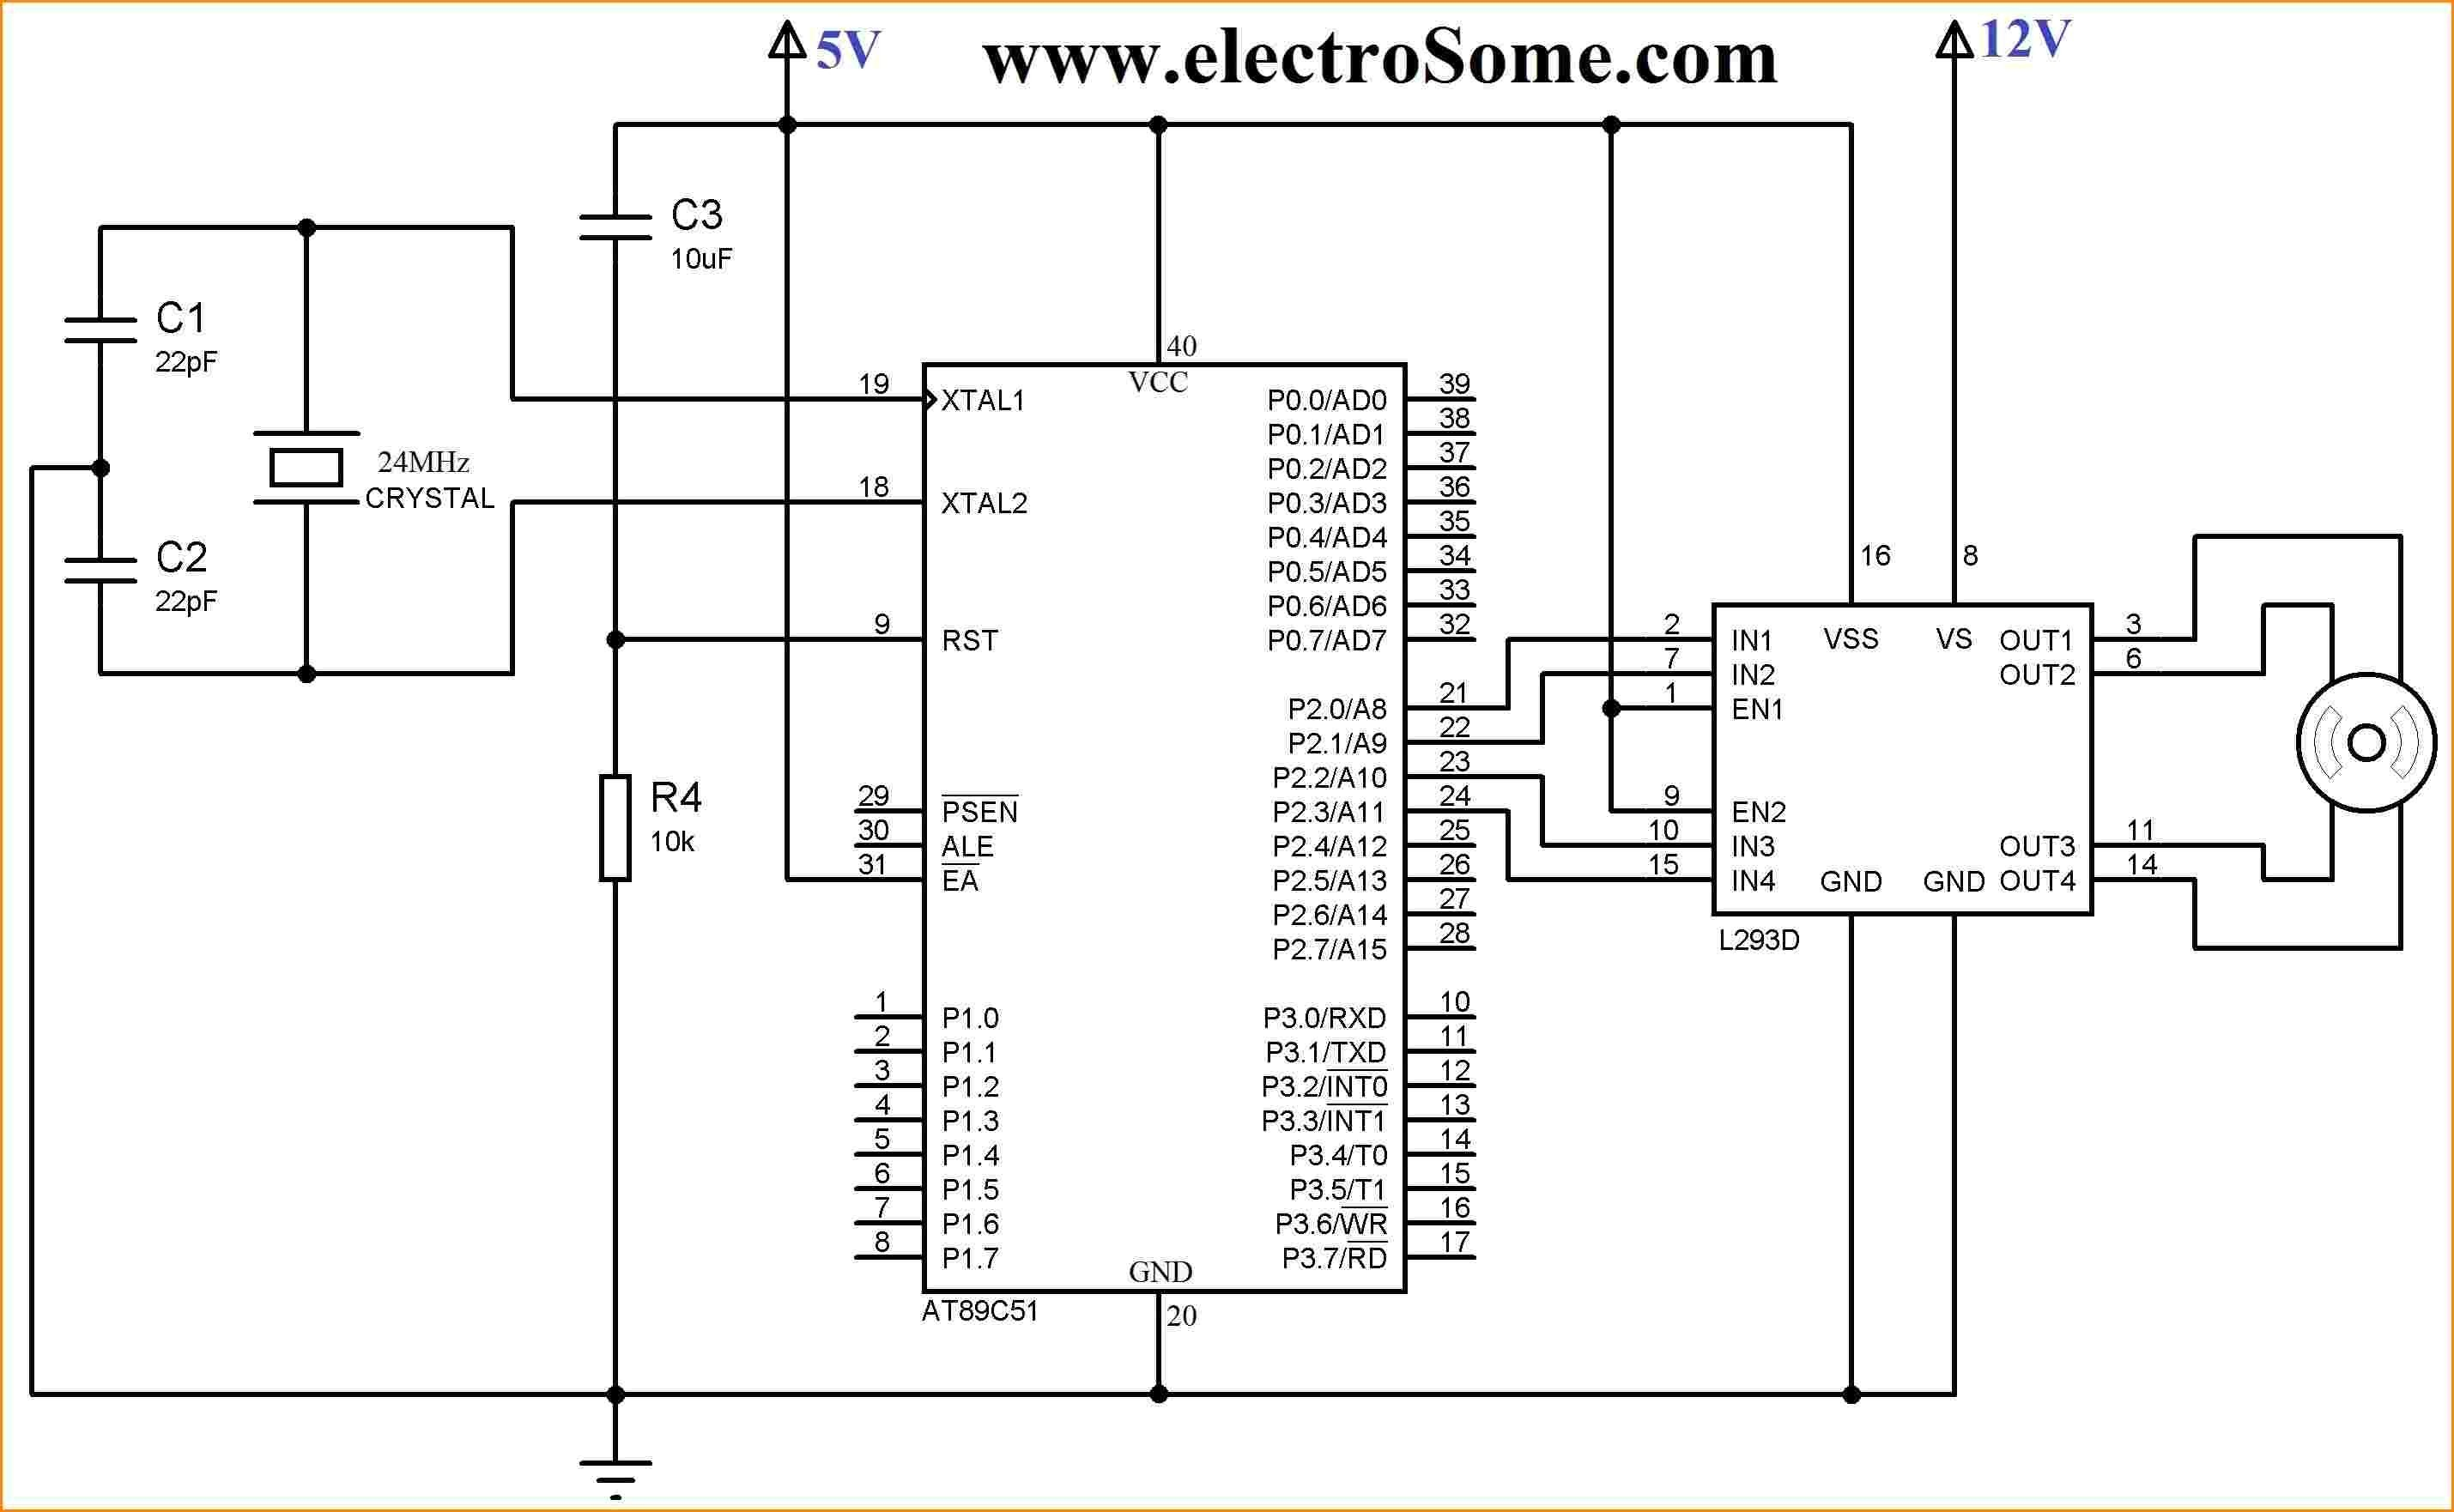 tork photocell wiring diagram 2005 jeep grand cherokee aftermarket radio pdf image